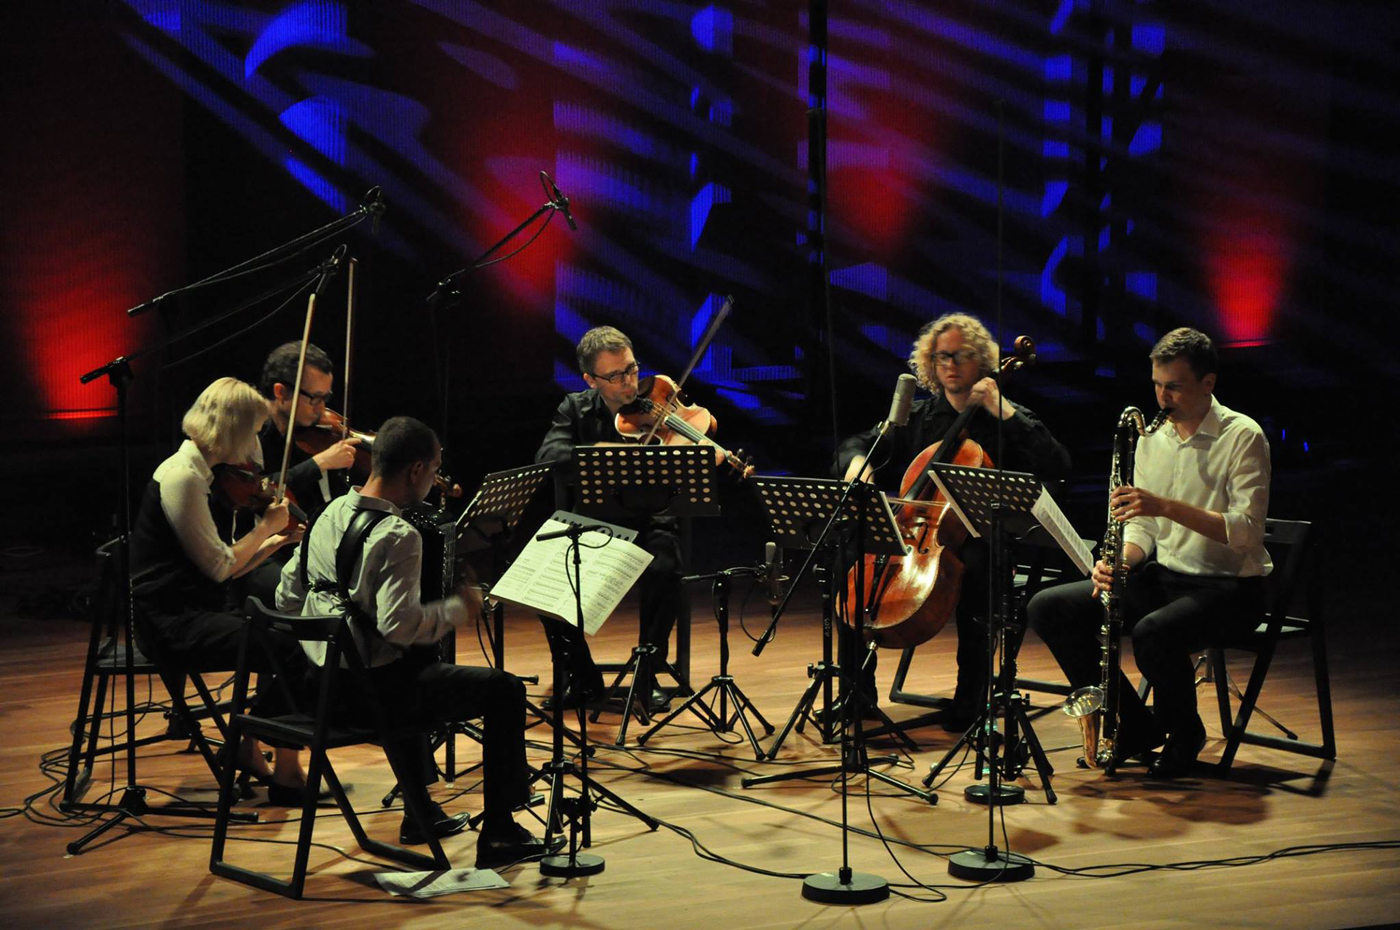 Hear The Dybbuk | Jarosław Bester & Marcin Malinowski & NeoQuartet